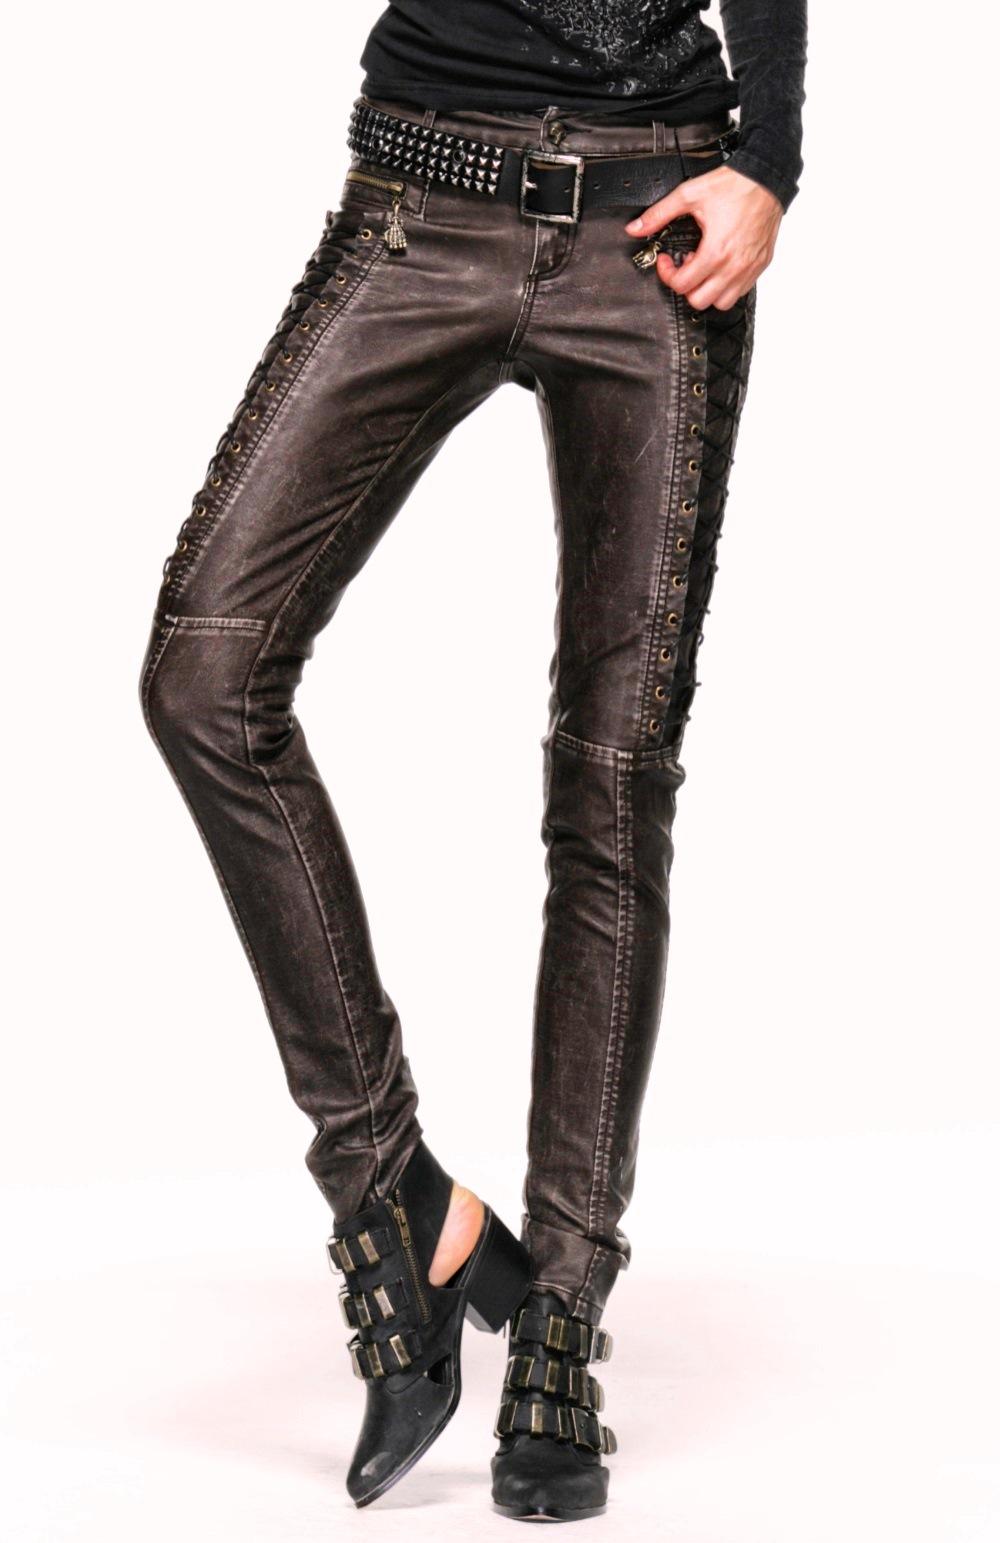 pantalon steampunk femme en simili cuir marron punk rave k202. Black Bedroom Furniture Sets. Home Design Ideas